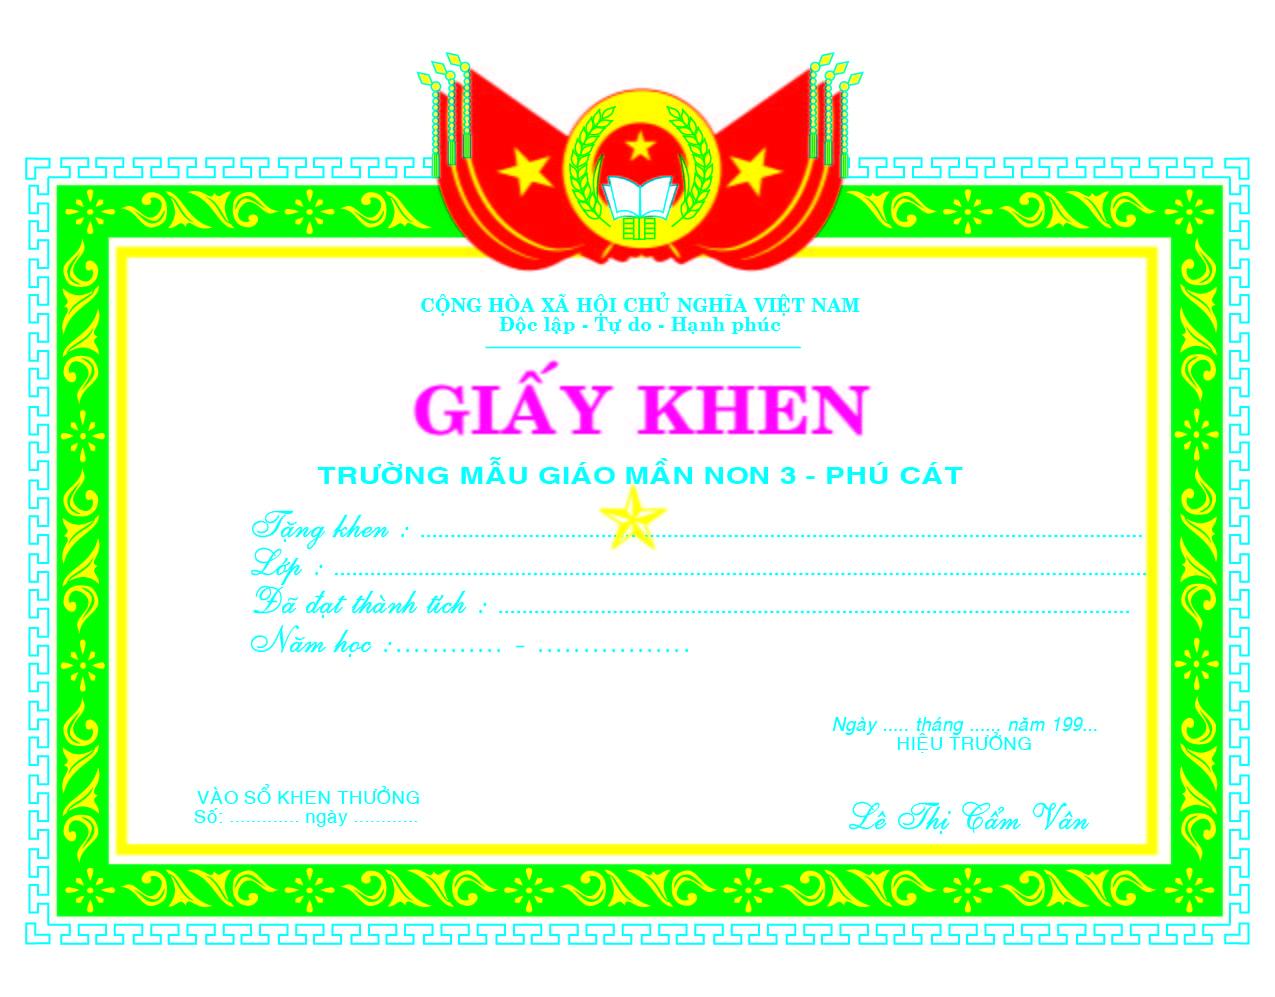 Mẫu giấy khen 037 - Mẫu giấy khen trường mẫu giáo - link download : https://adsnew.net/KUUt